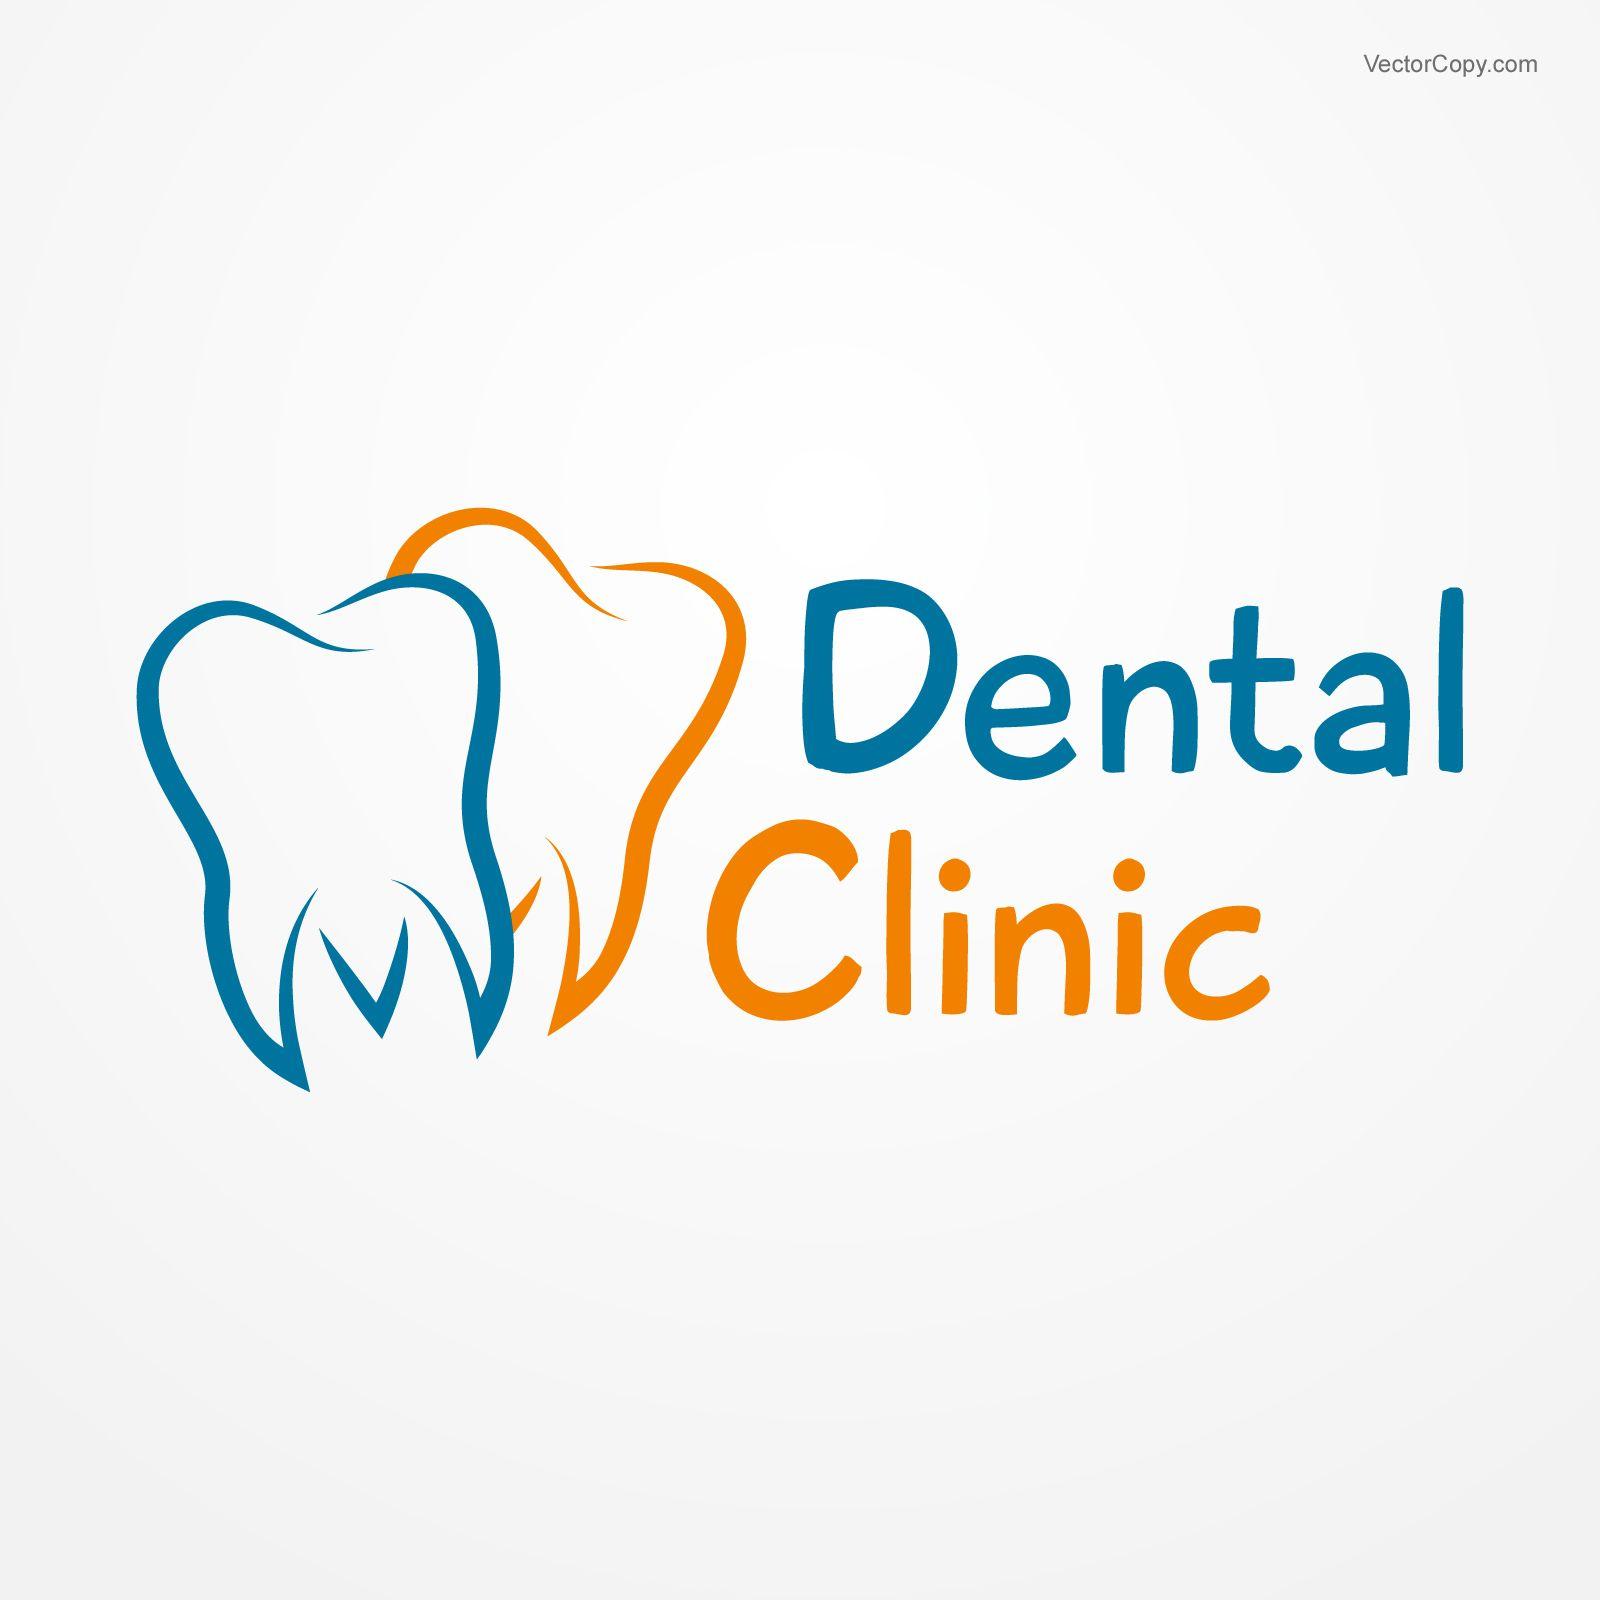 Dental clinic logo, free vector #vectorart #vectorclipart.